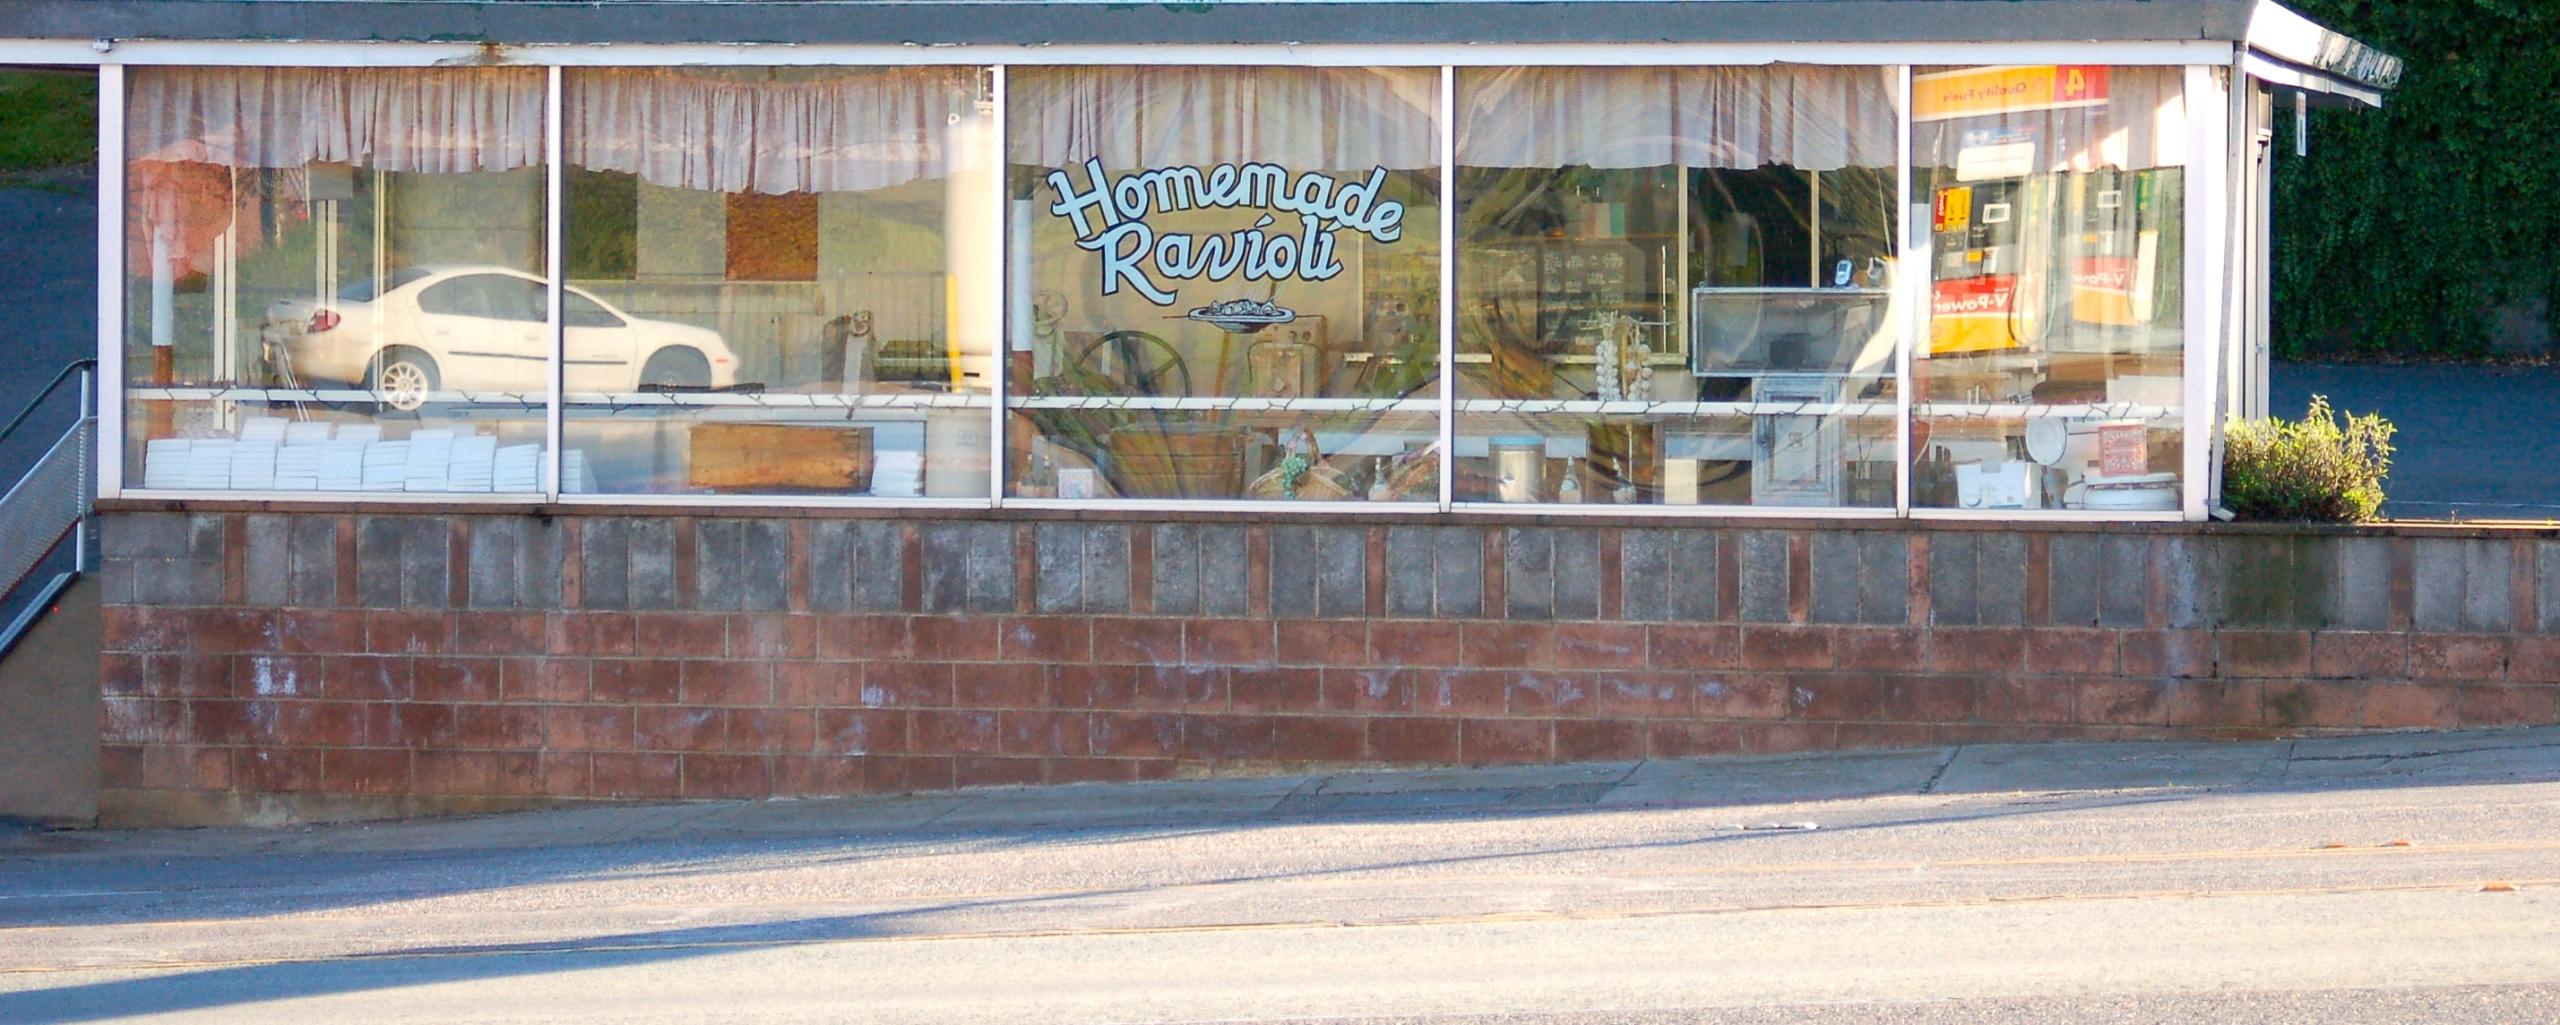 The Ravioli Shop in Jackson, CA.